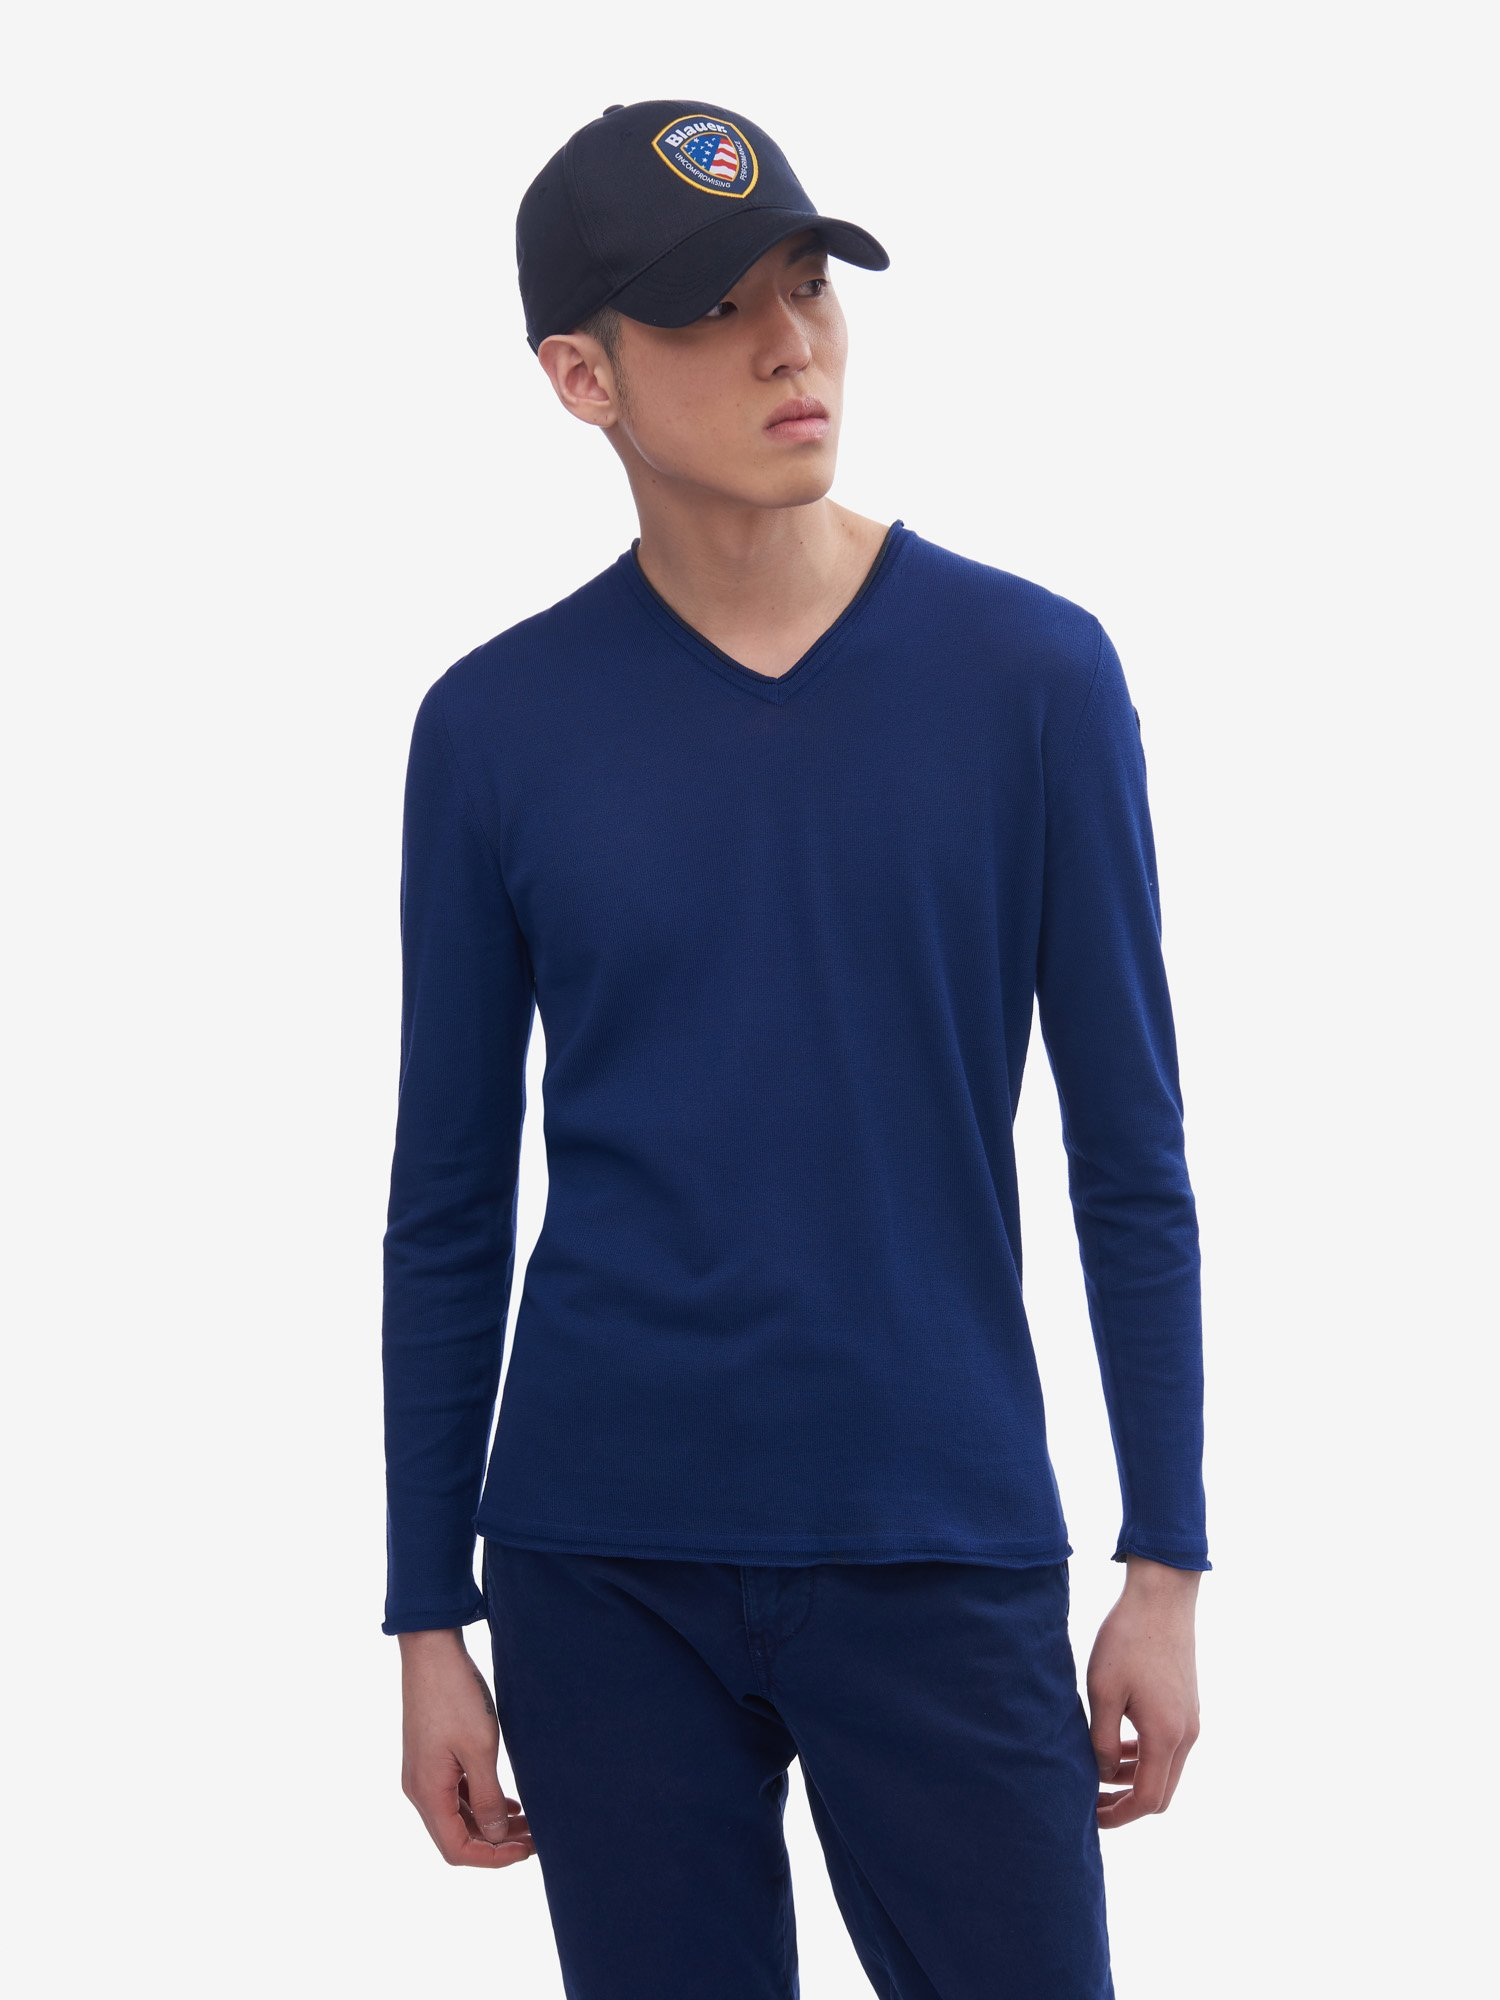 Blauer - PLAIN KNIT V-NECK SWEATER - Ultramarine Blue - Blauer